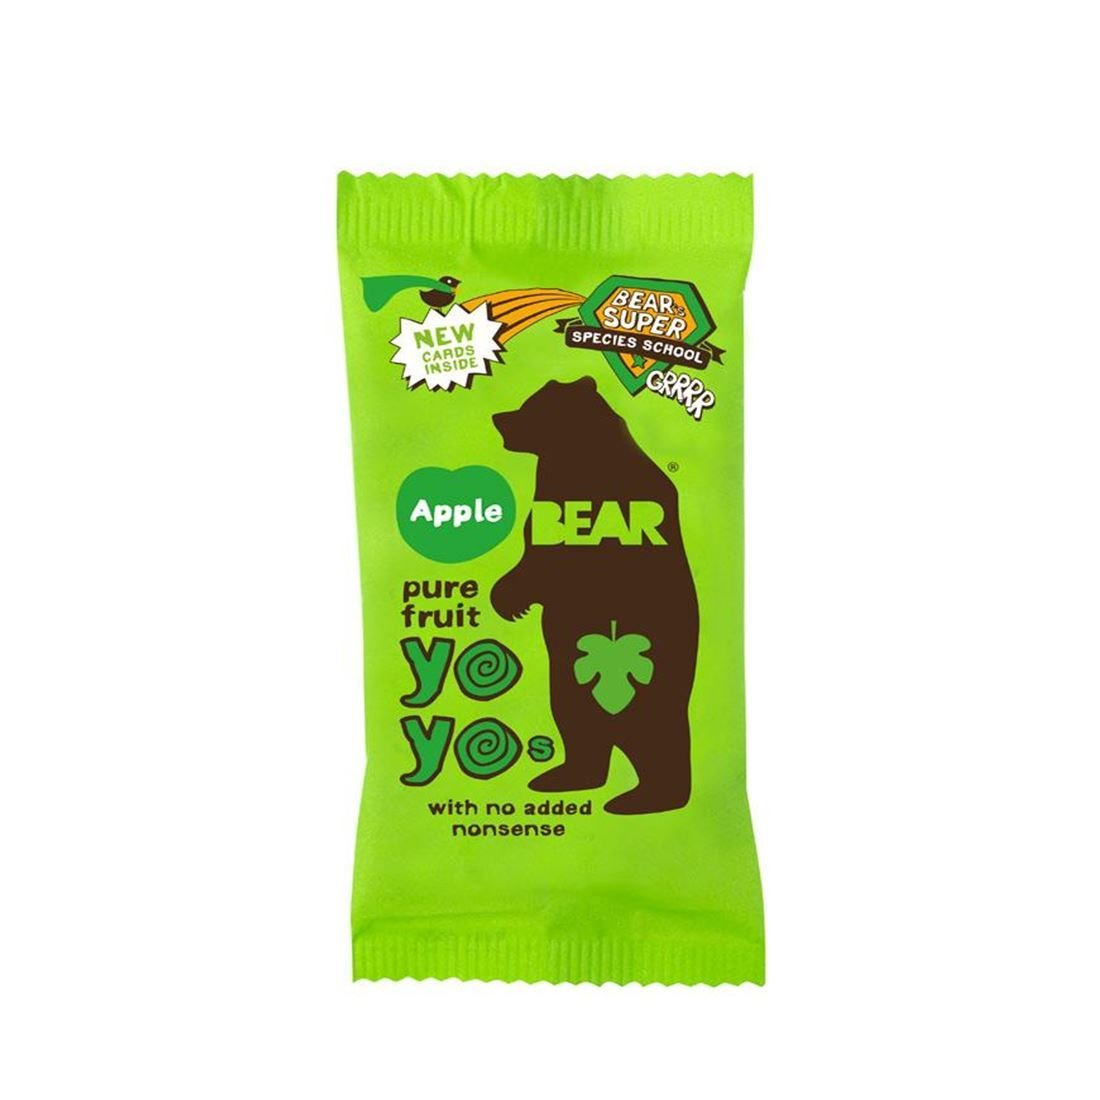 Bear | Yoyo Pure Fruit Rolls - Apple | 18 x 20G